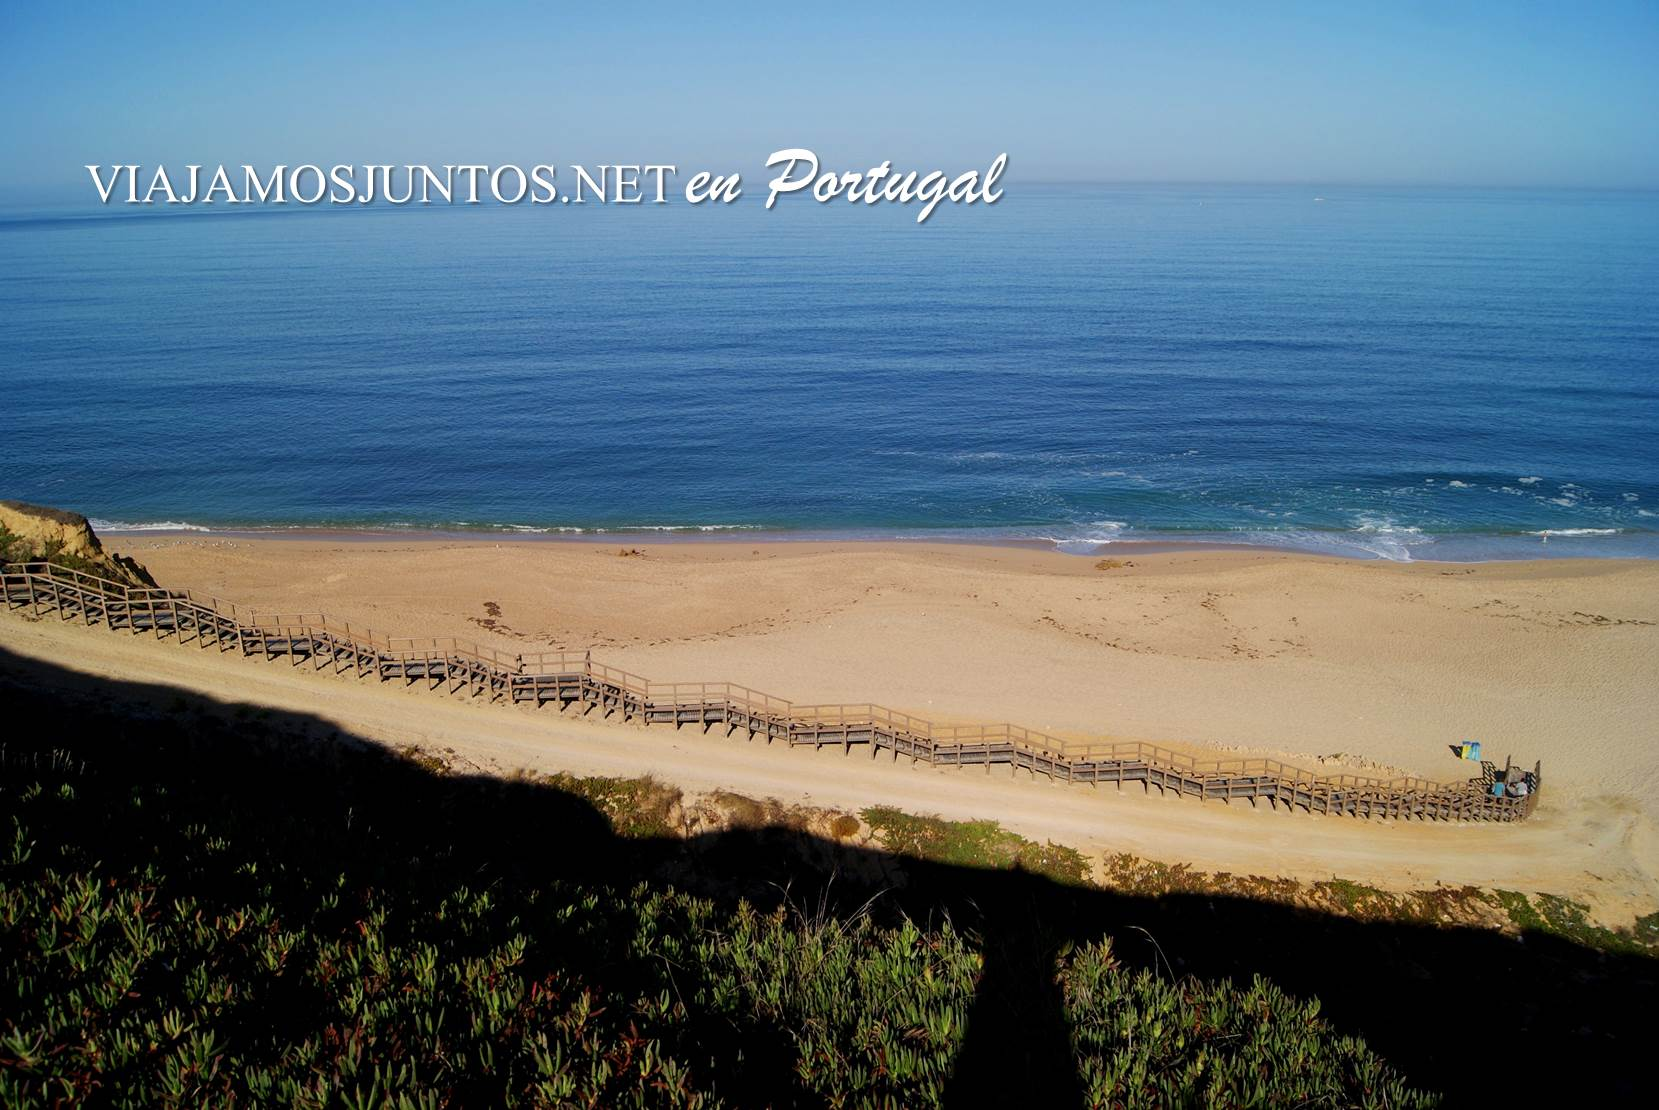 Escalera de la Playa do Meco, Costa Caparica, Portugal